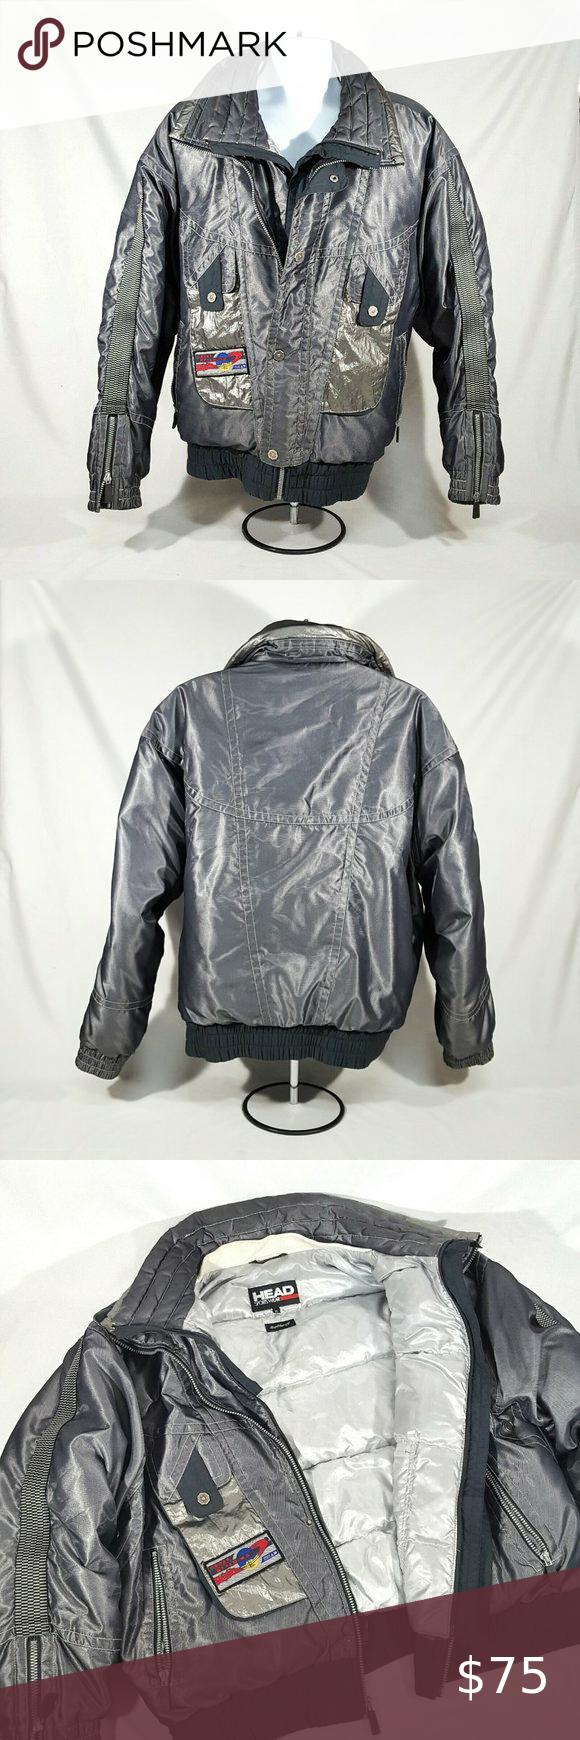 Vintage Head Solar Dynamics Metallic Puffer Jacket Jackets Puffer Jackets Puffer [ 1740 x 580 Pixel ]